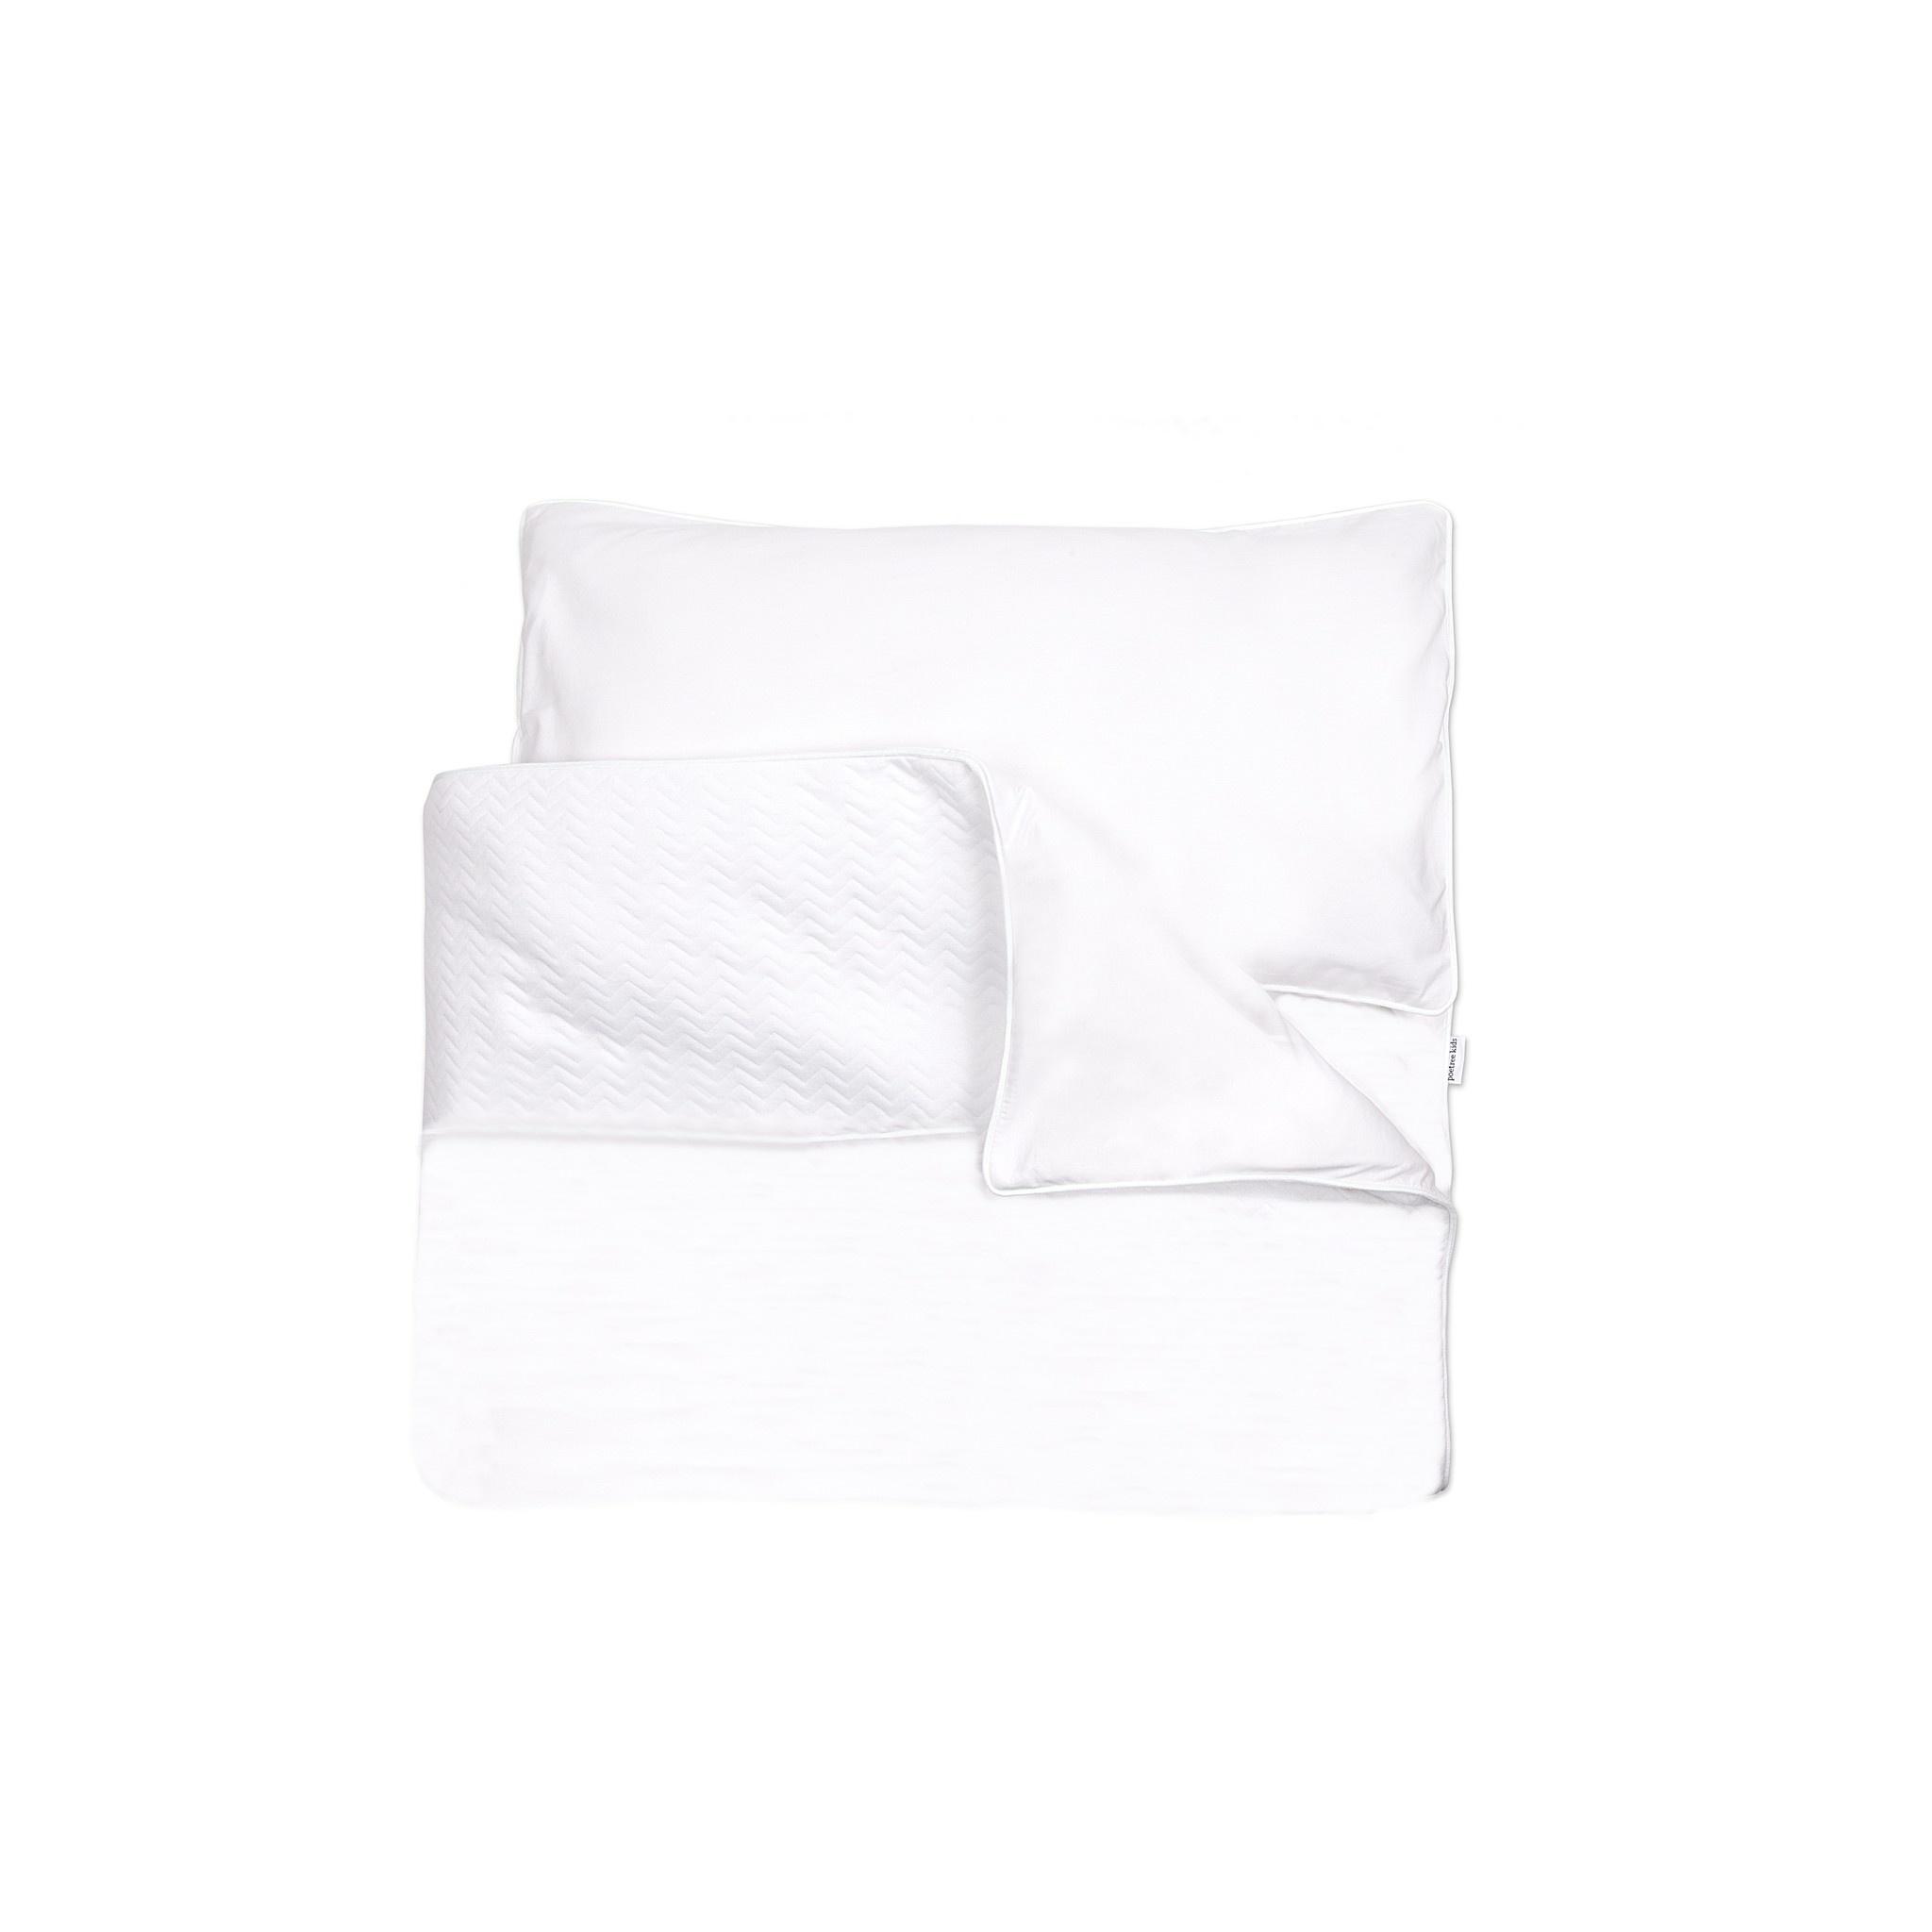 Donsovertrek bed met sloop Poetree Chevron White Collection-1